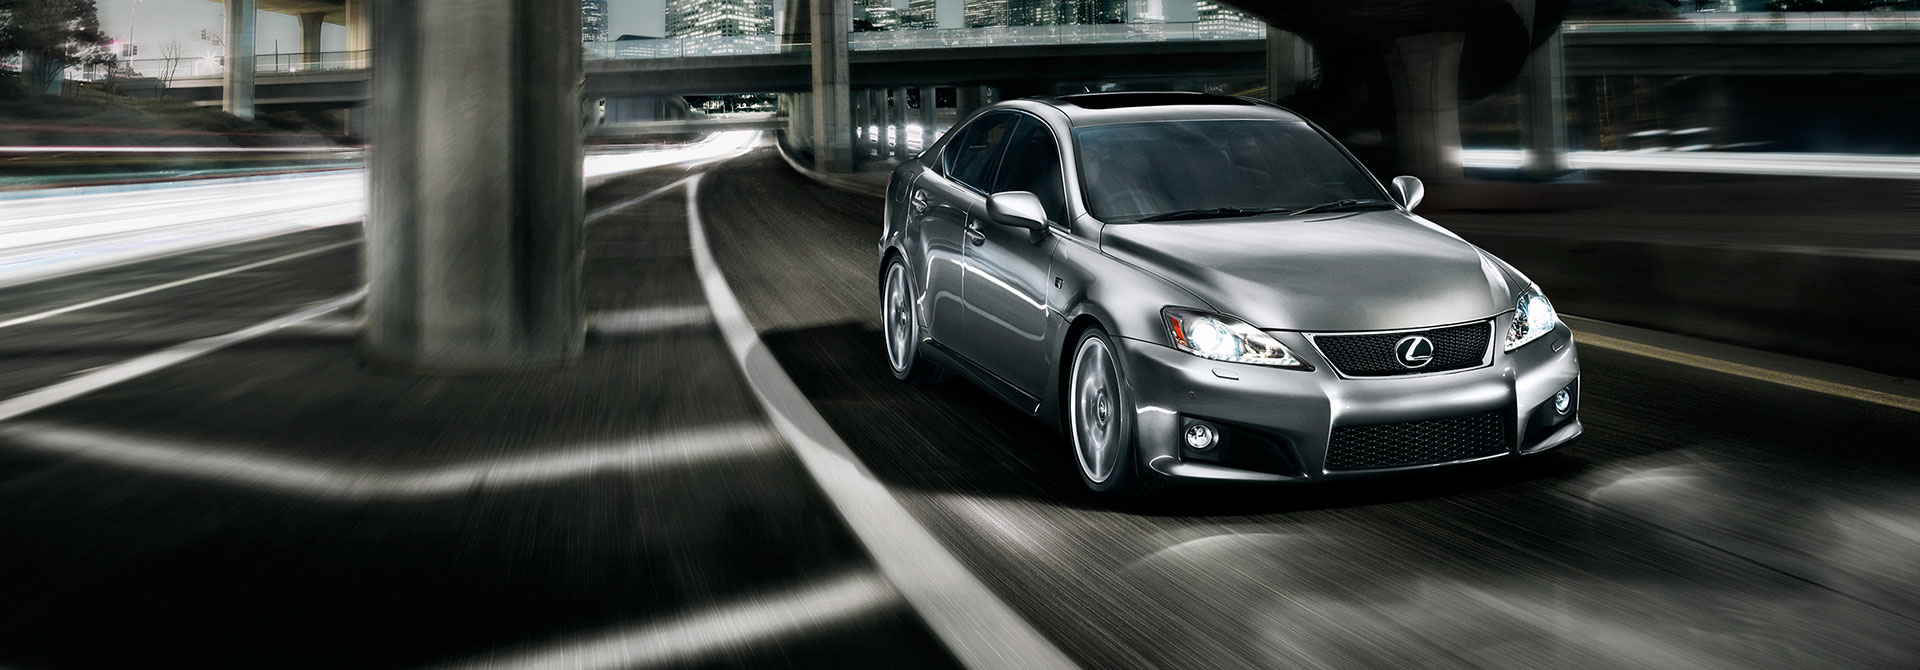 Lexus Roadside Assistance >> Lexus Downtown Lexus Roadside Assistance